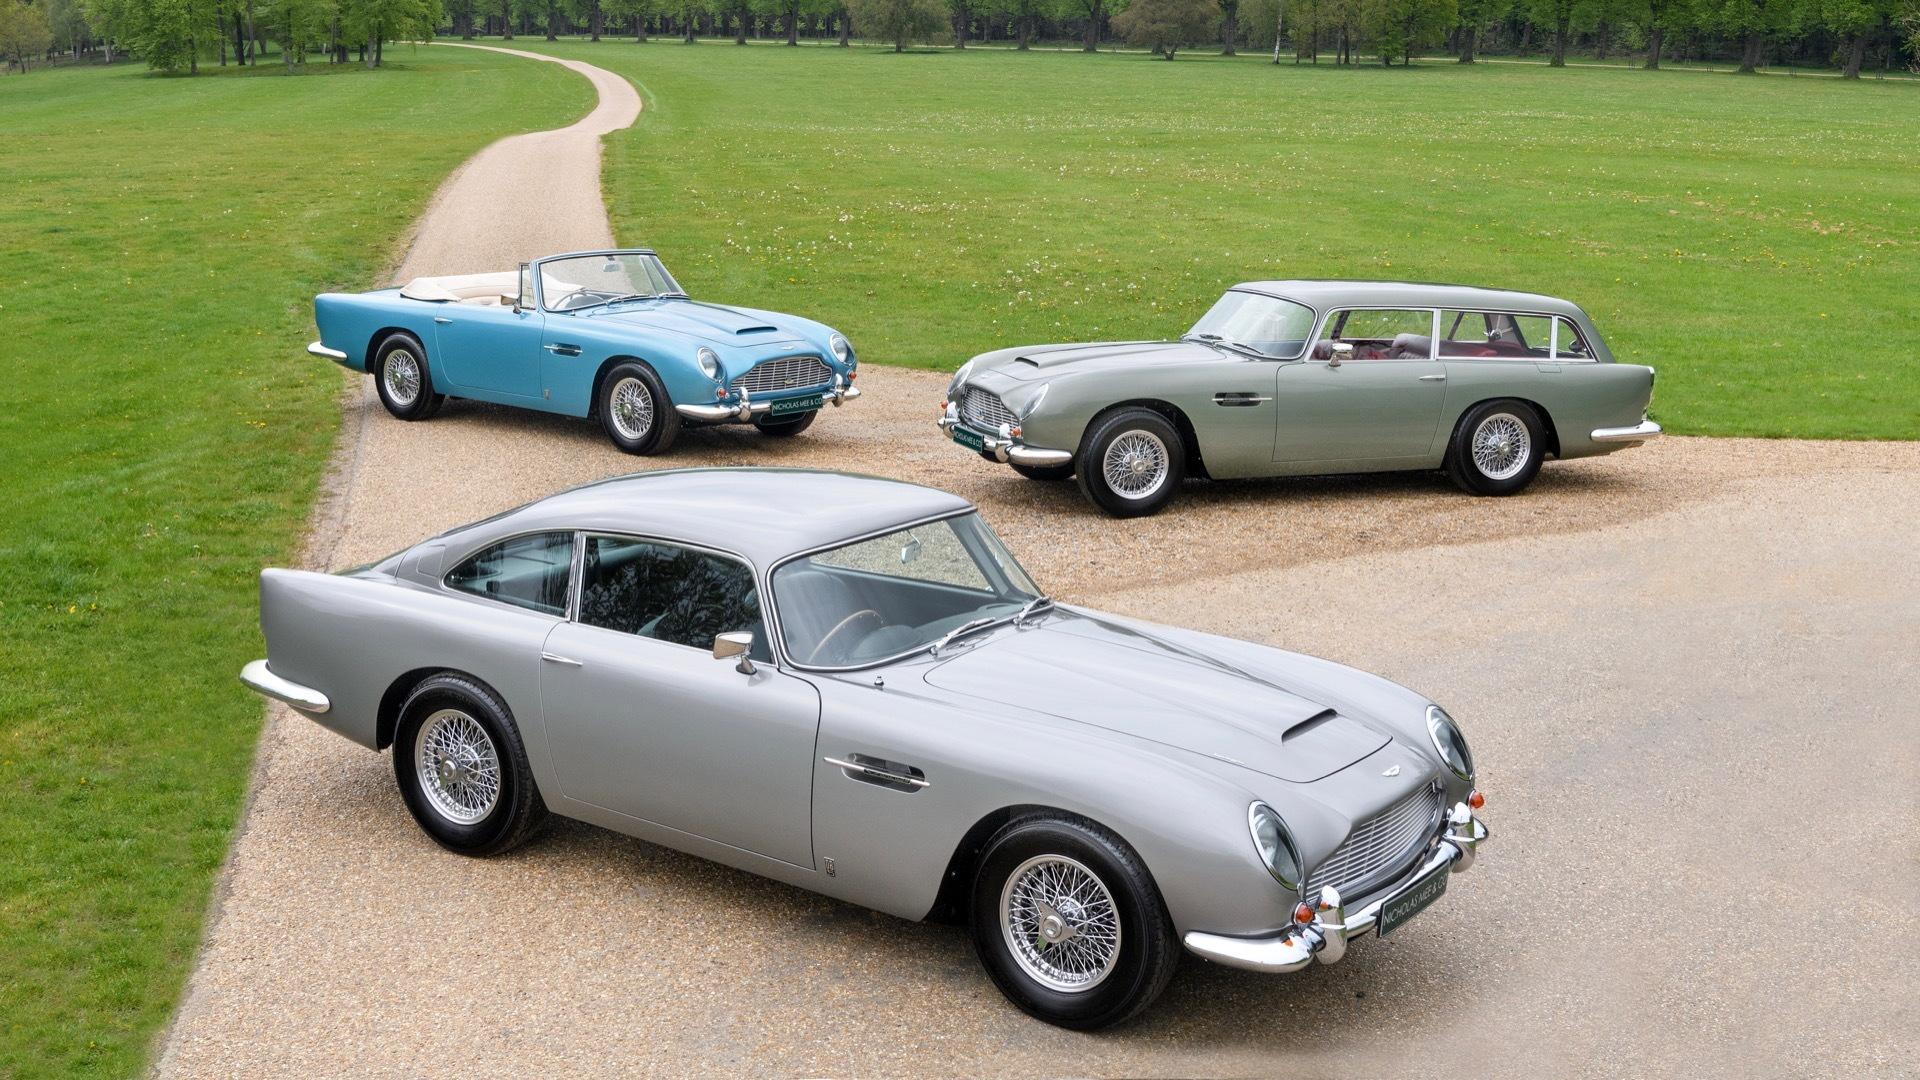 Aston Martin DB5 trio (Photo by Nicholas Mee & Co.)